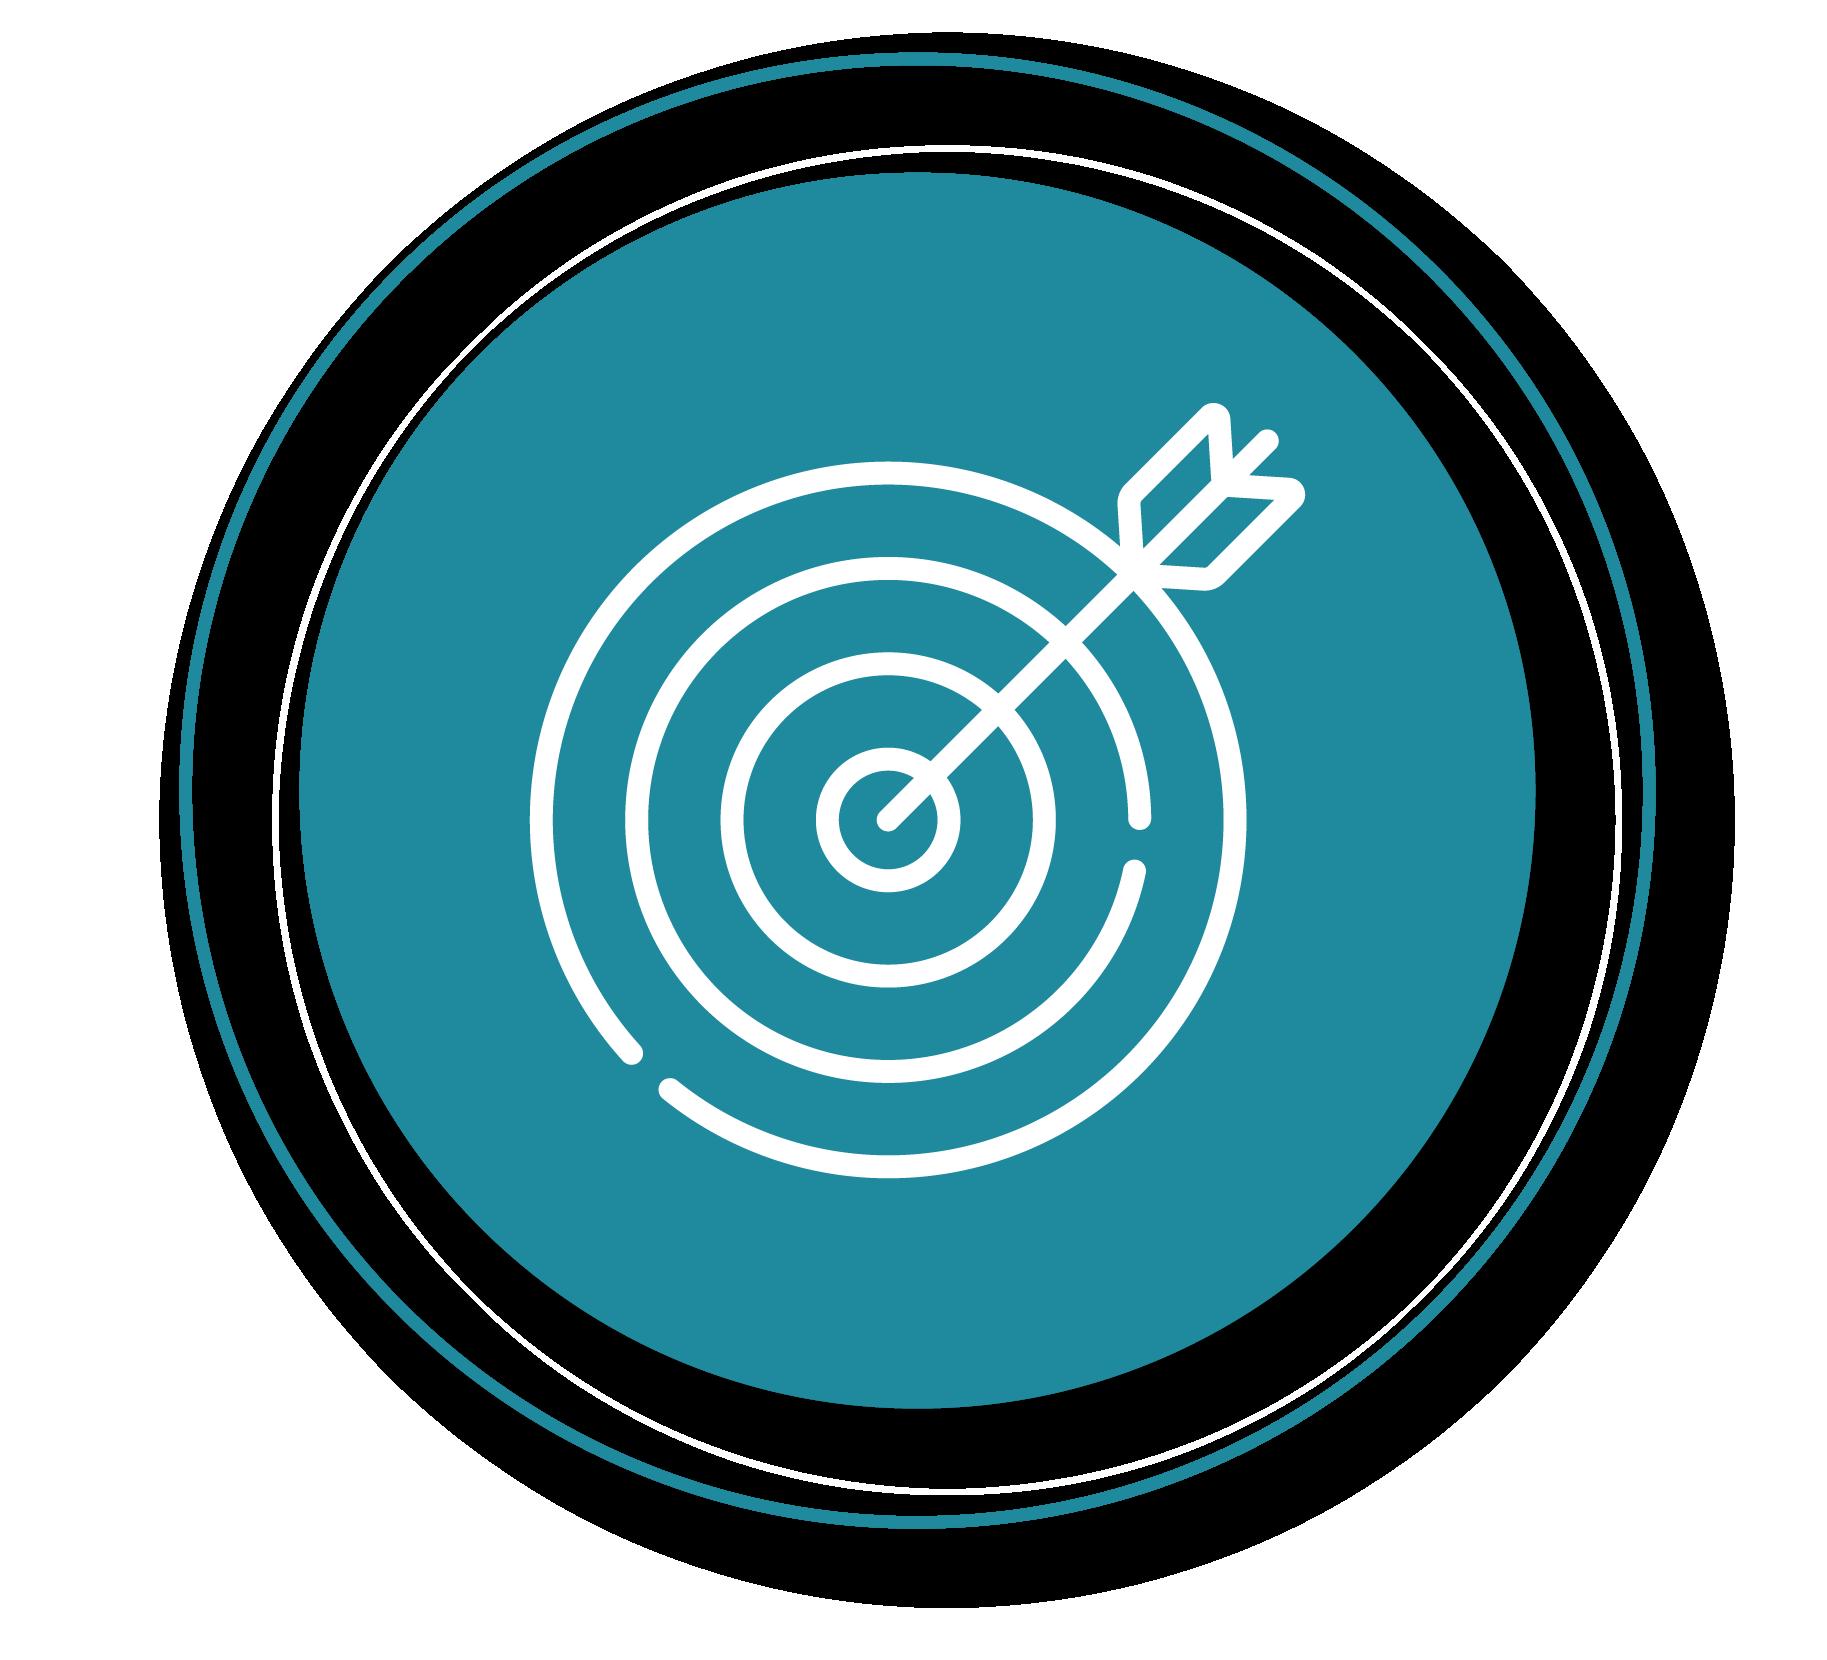 arrow on target icon